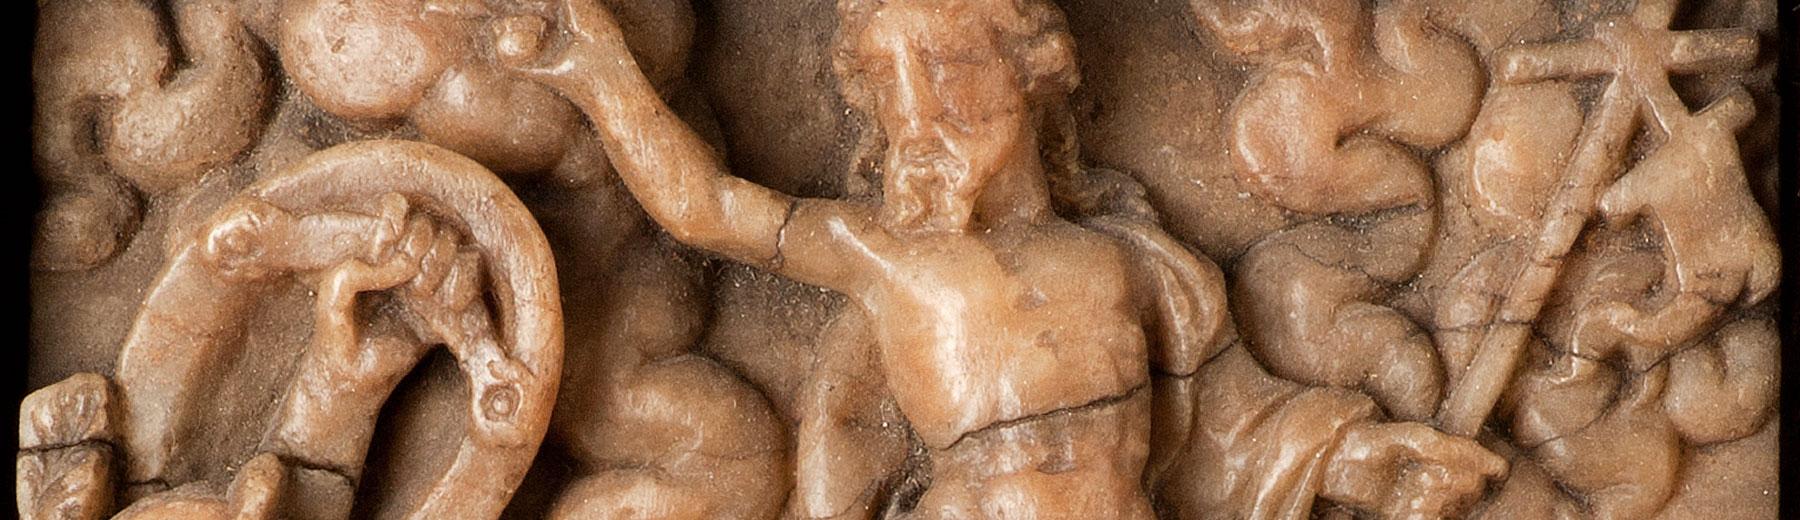 The Assumption, alabaster, Mechelen (?), ca. 1630 (copyright: M - Museum Leuven | photography: Paul Laes)